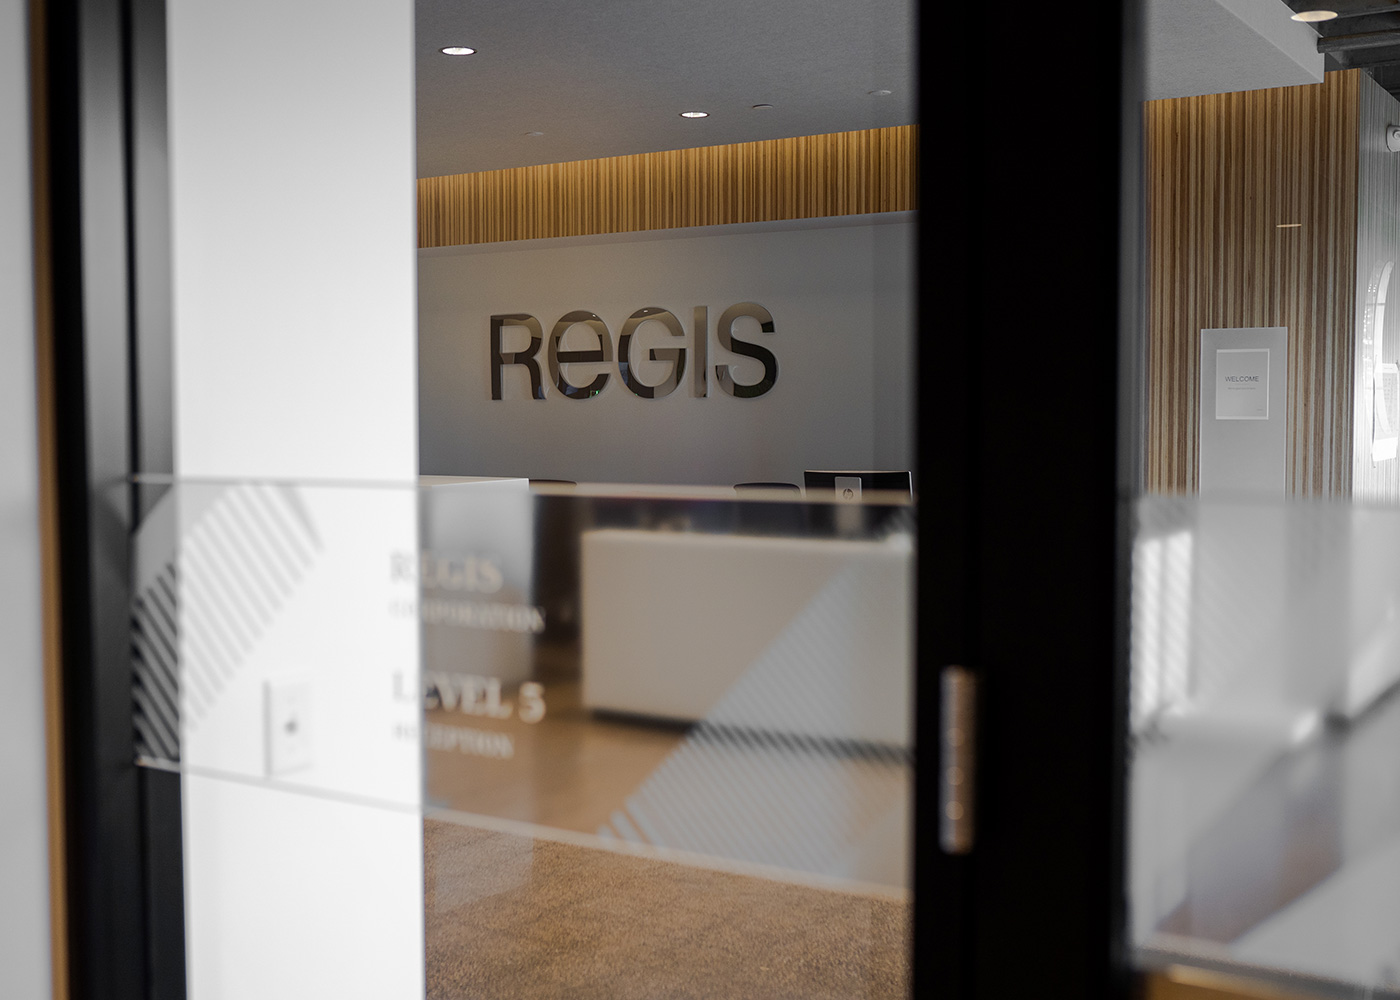 regis entrance